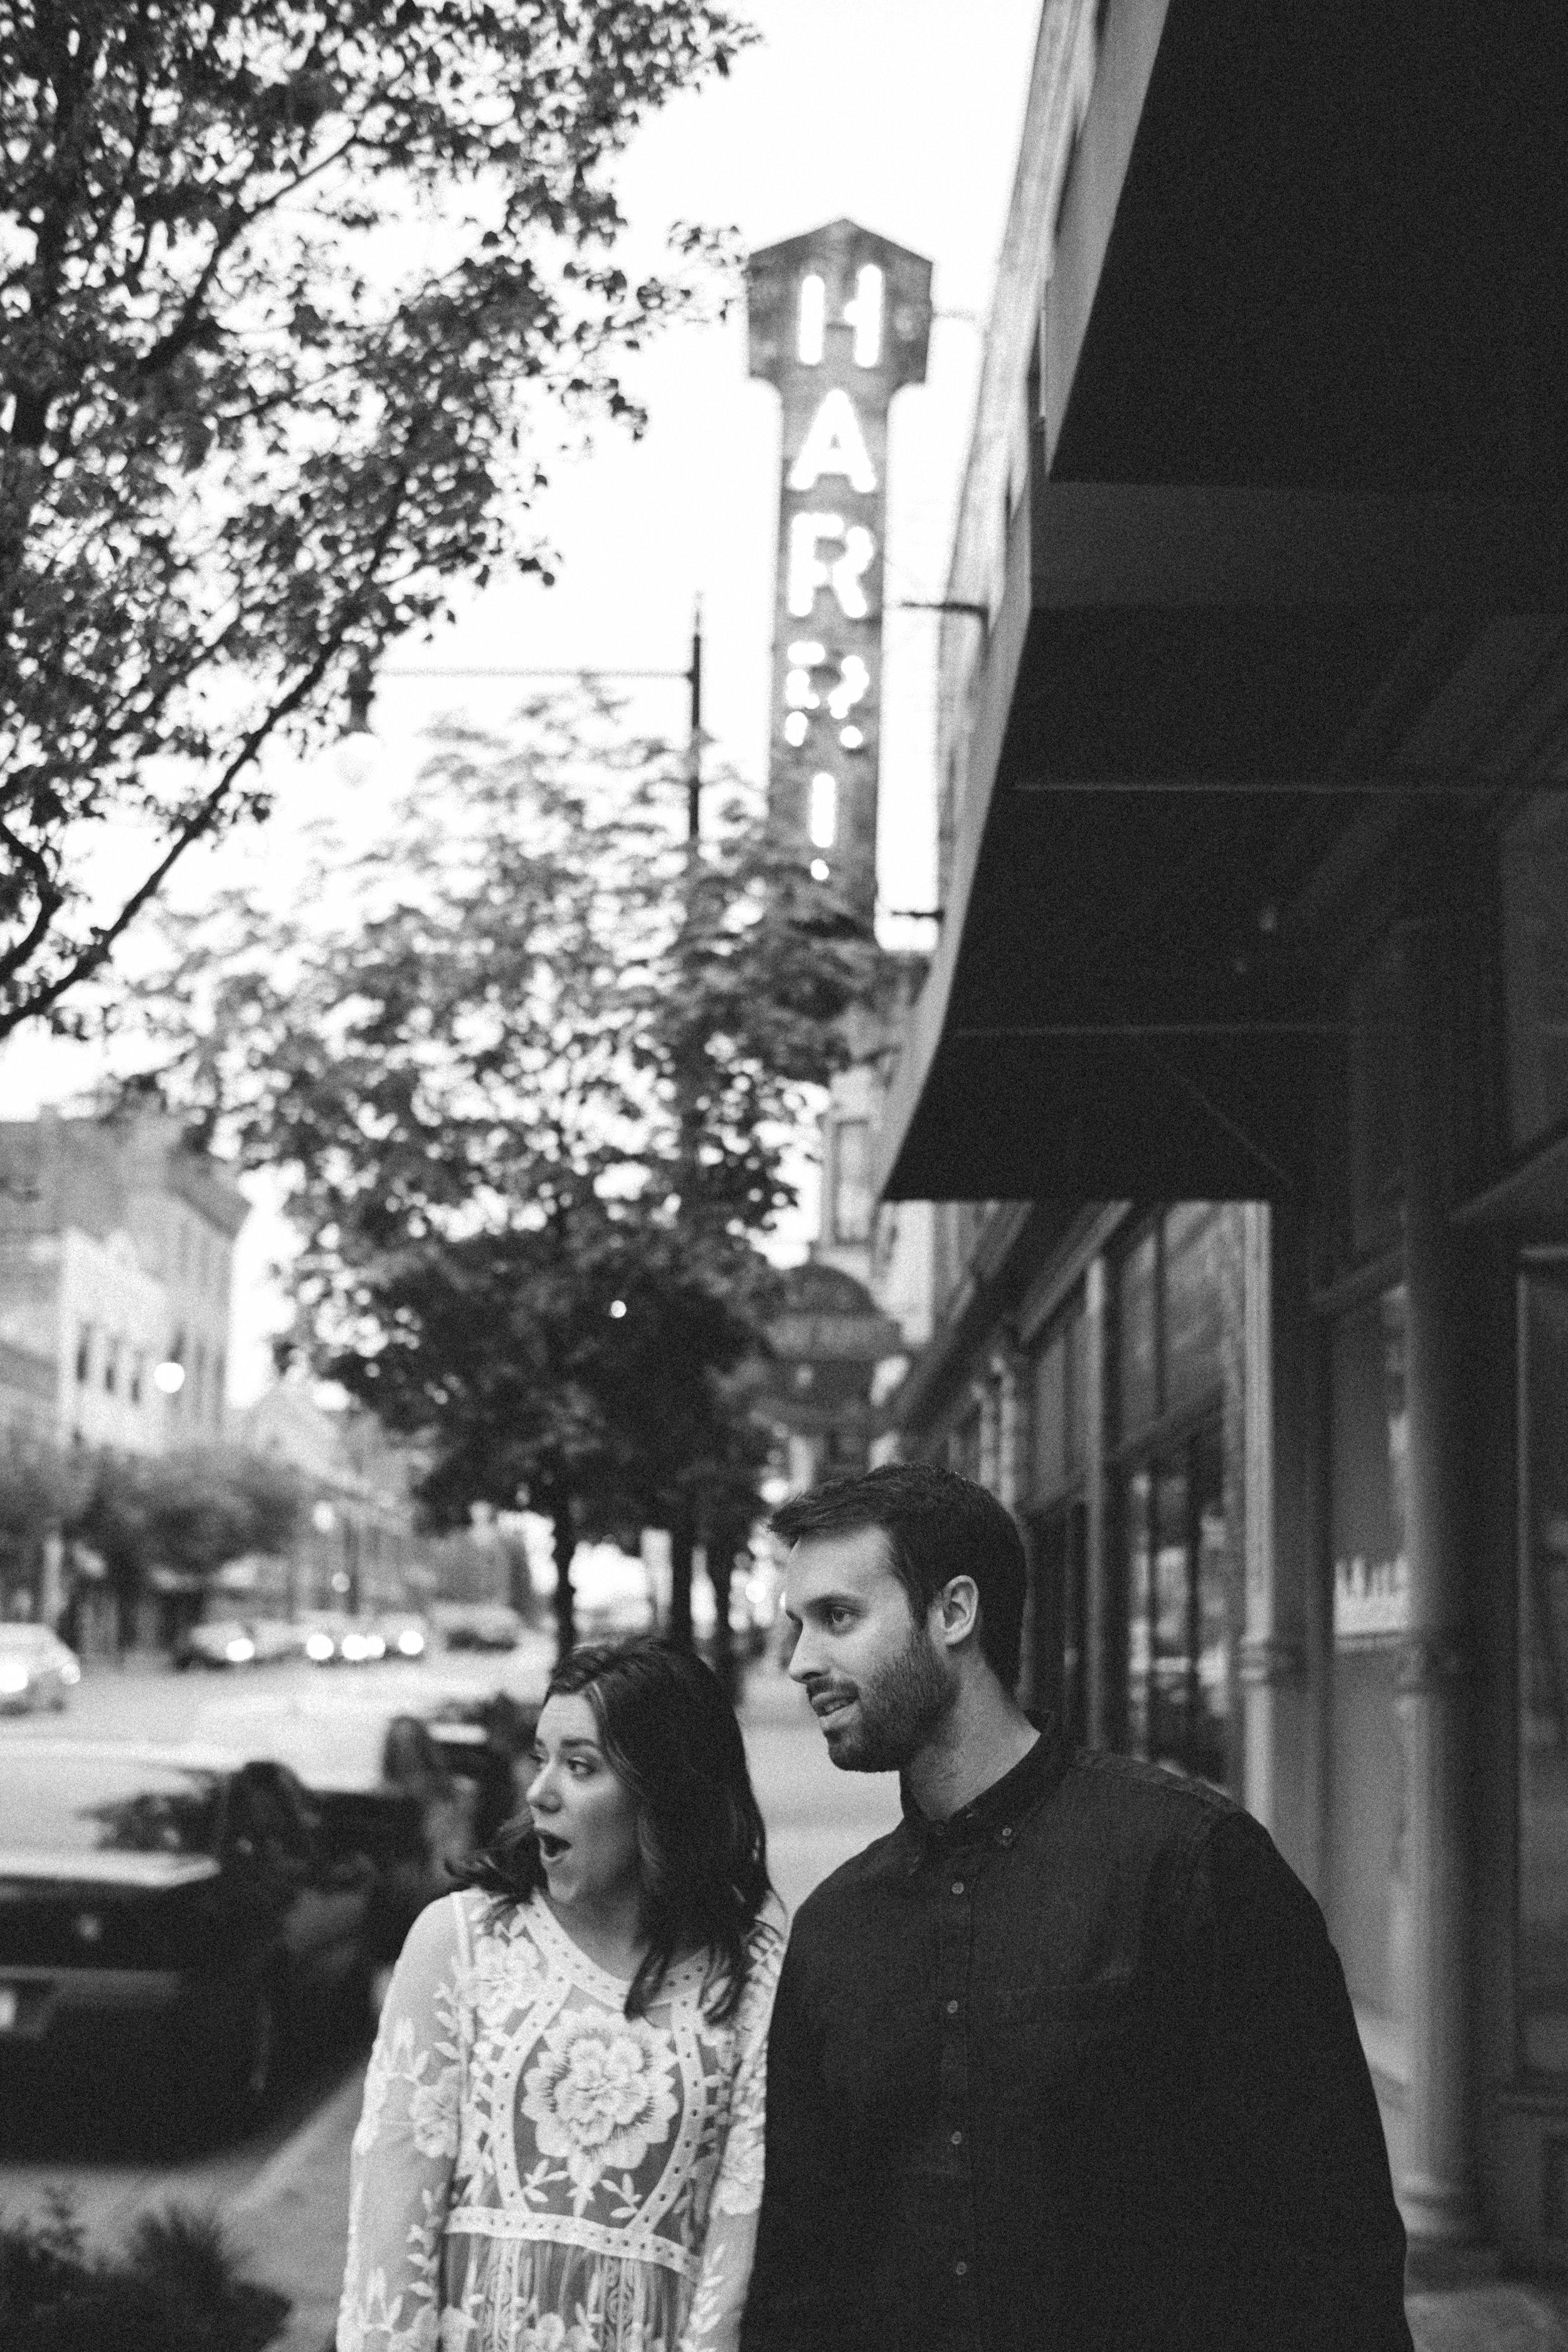 Lauren_Nick_Manzer_Bailey_Engagement_Photos_0203.jpg